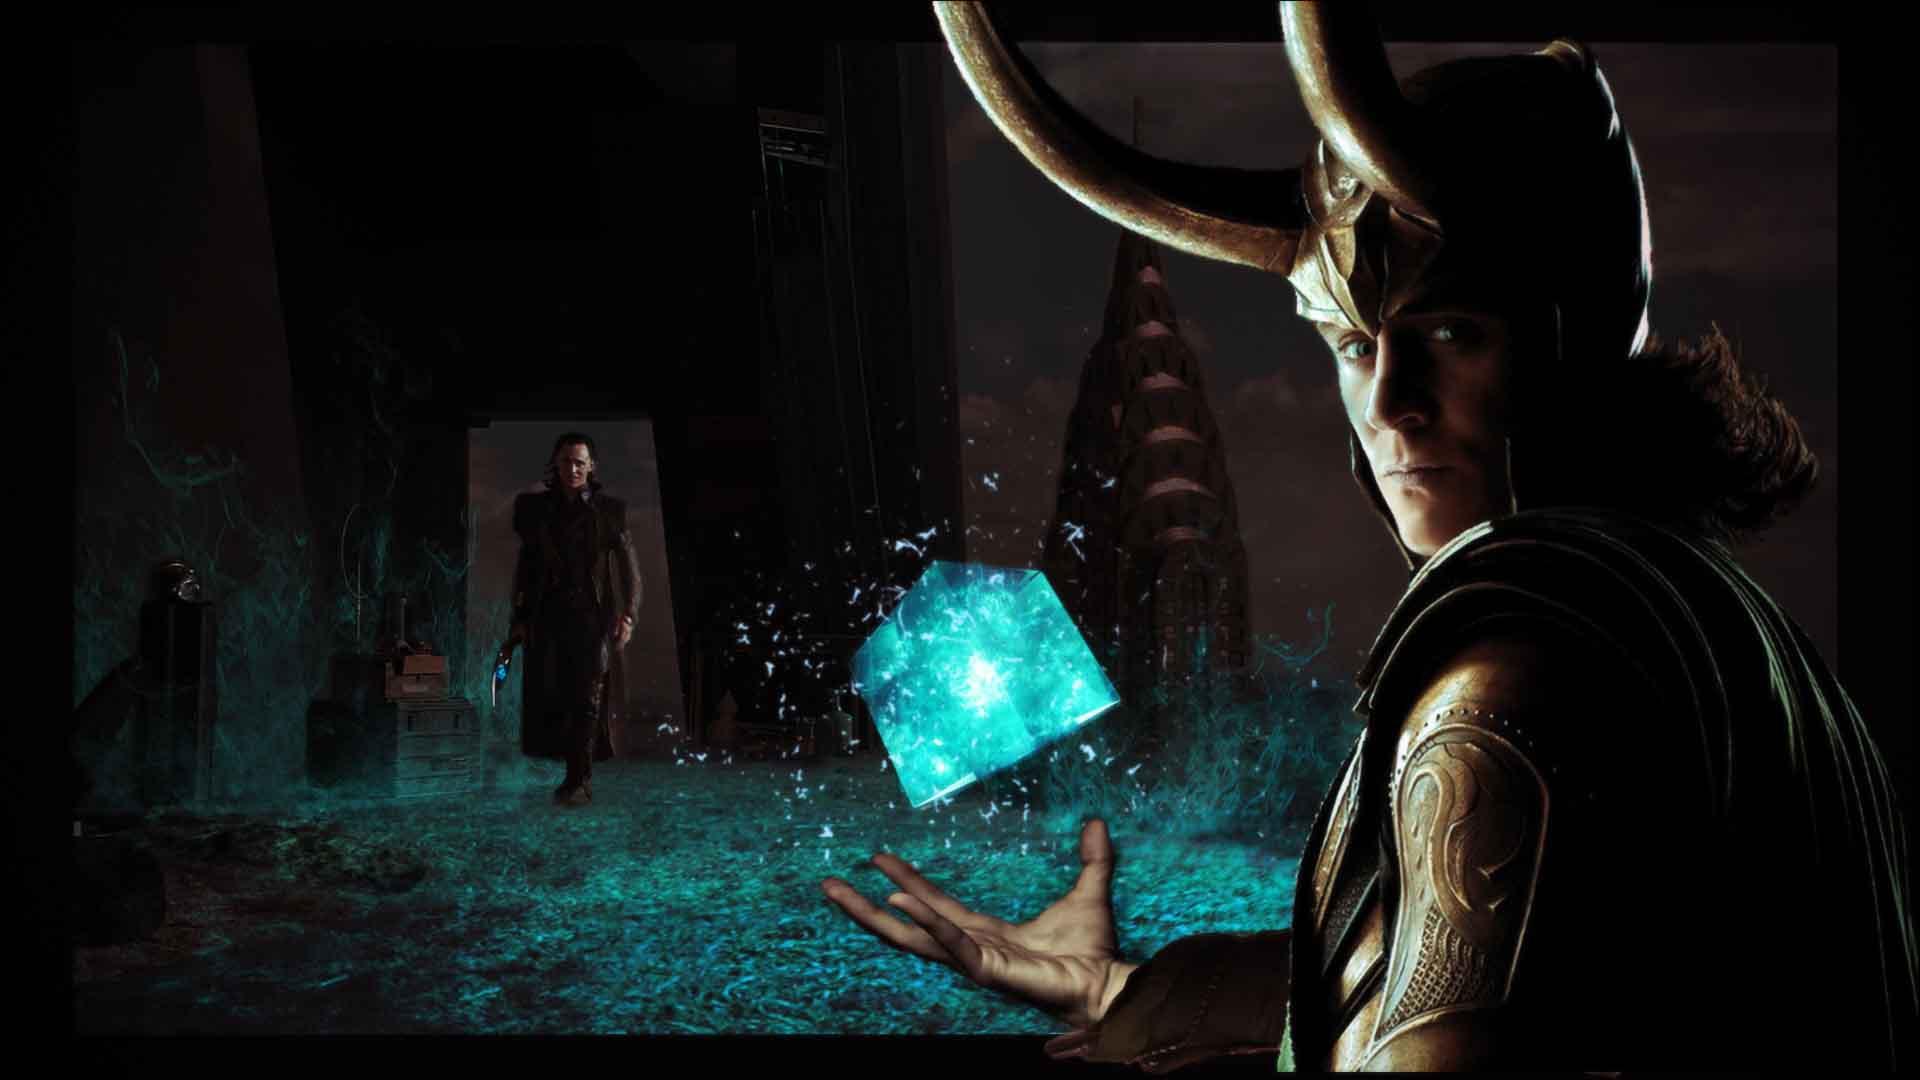 Marvel-Character-Loki